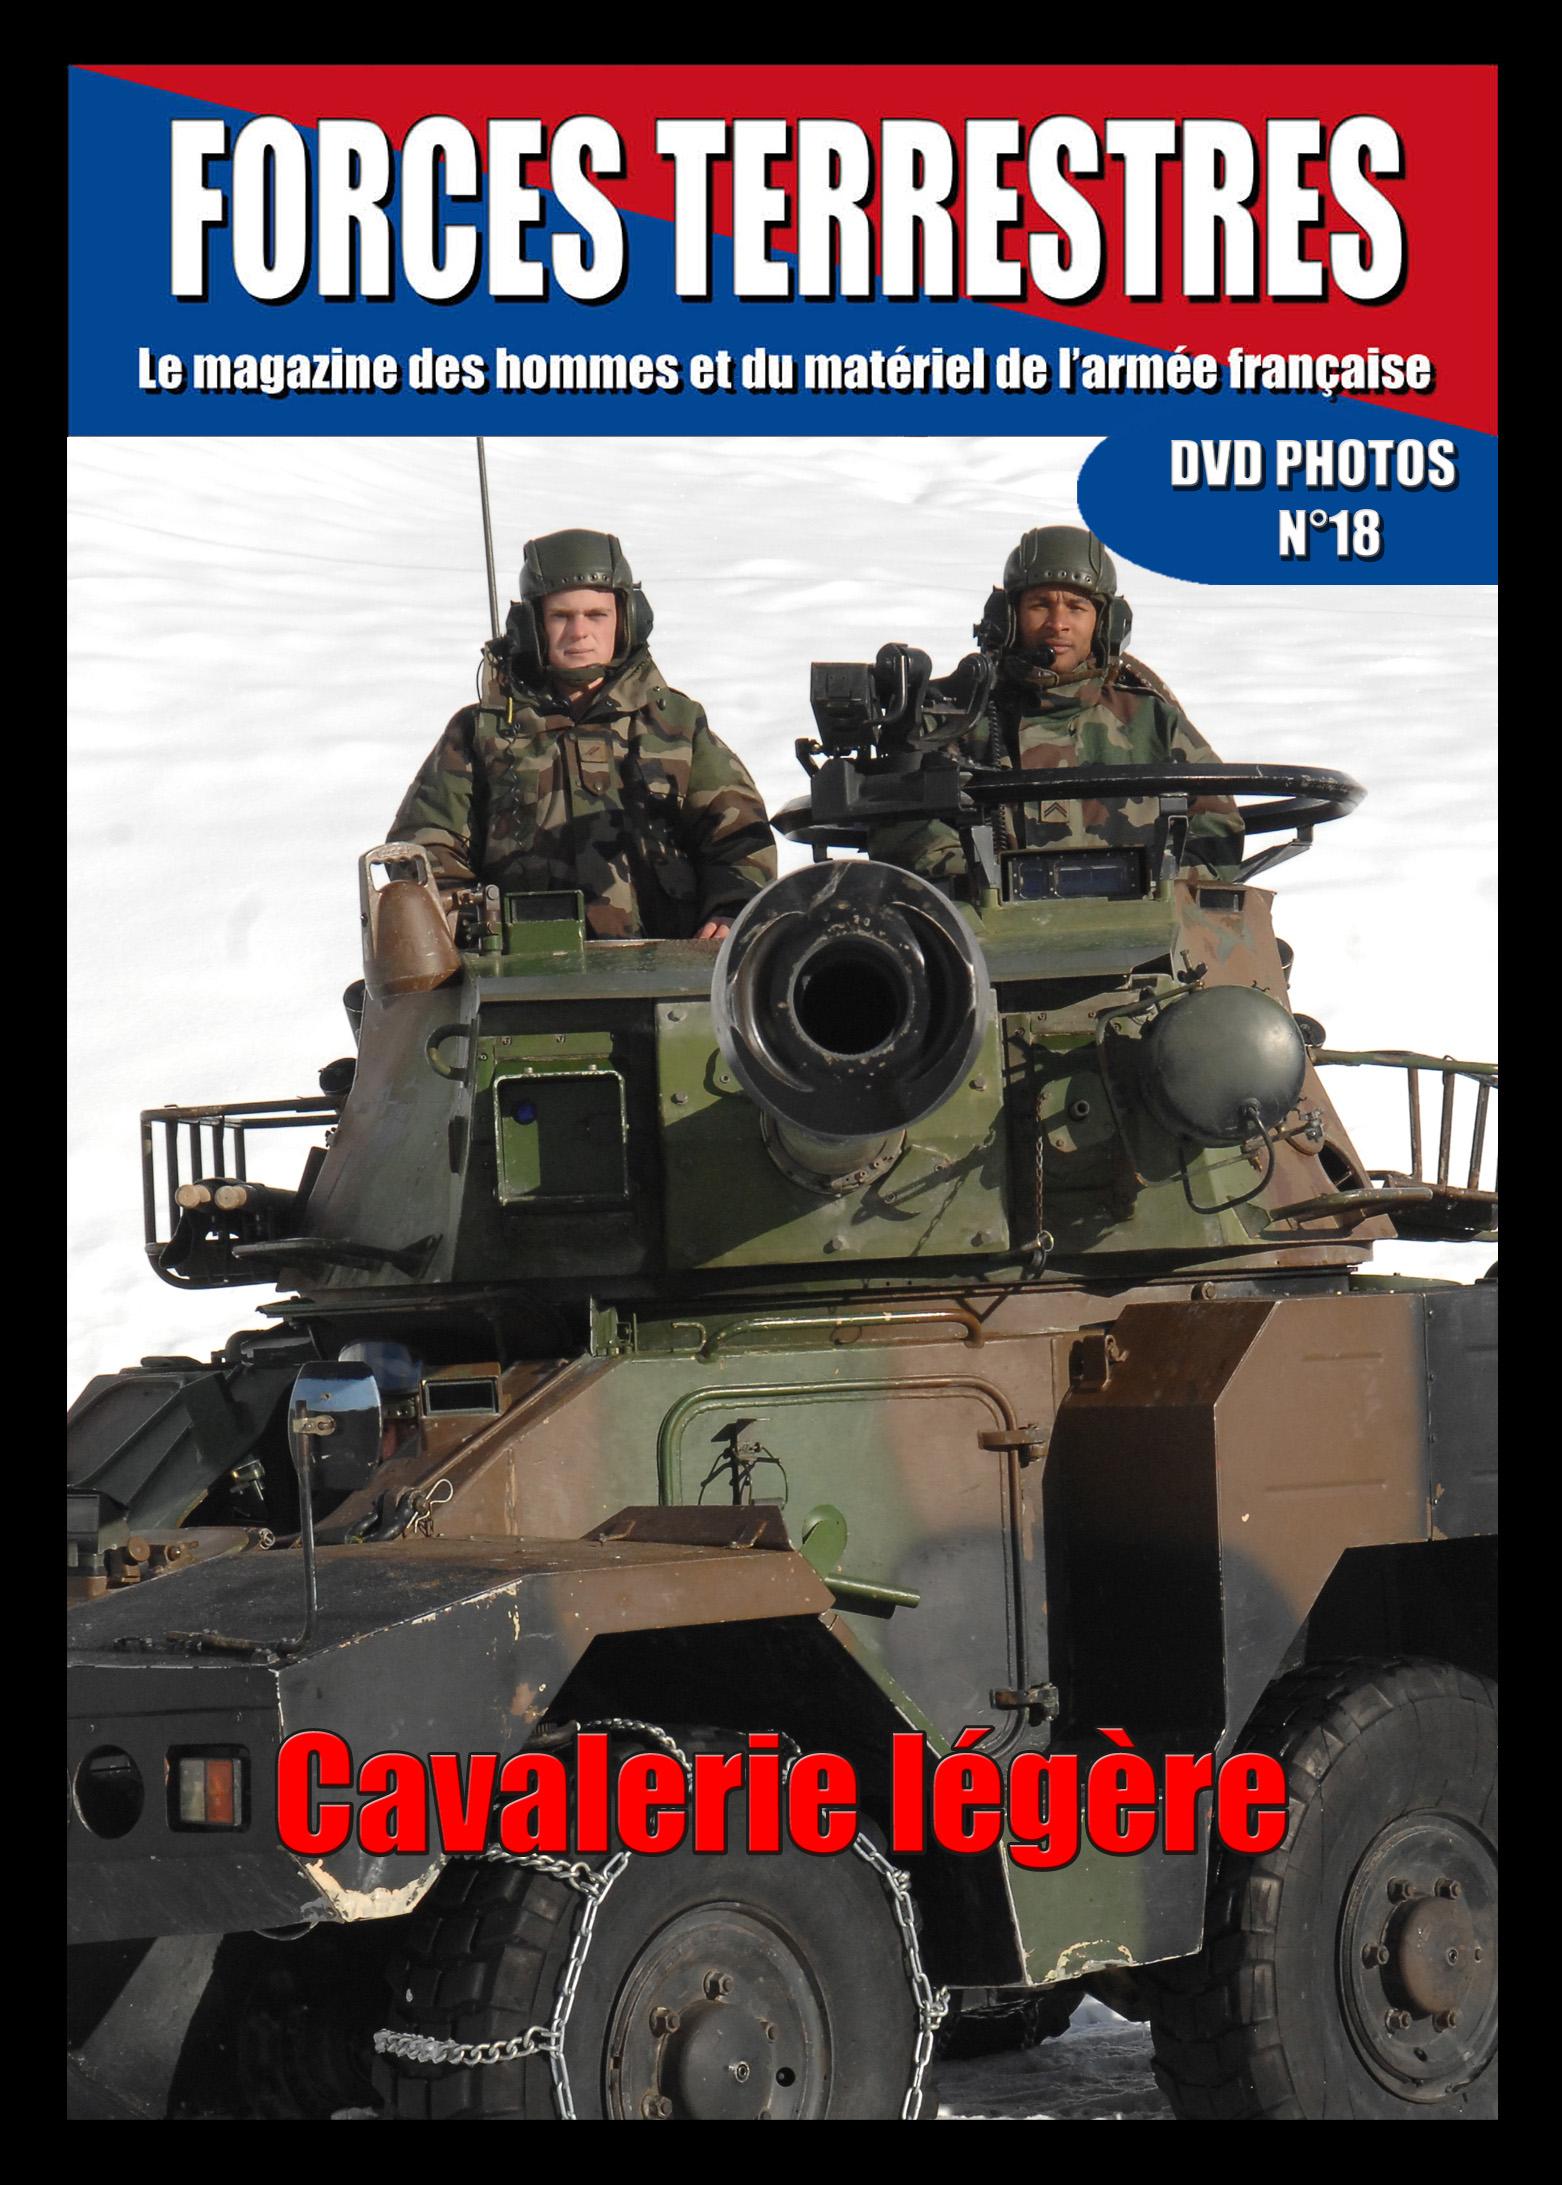 DVD  N°18 Cavalerie Légère